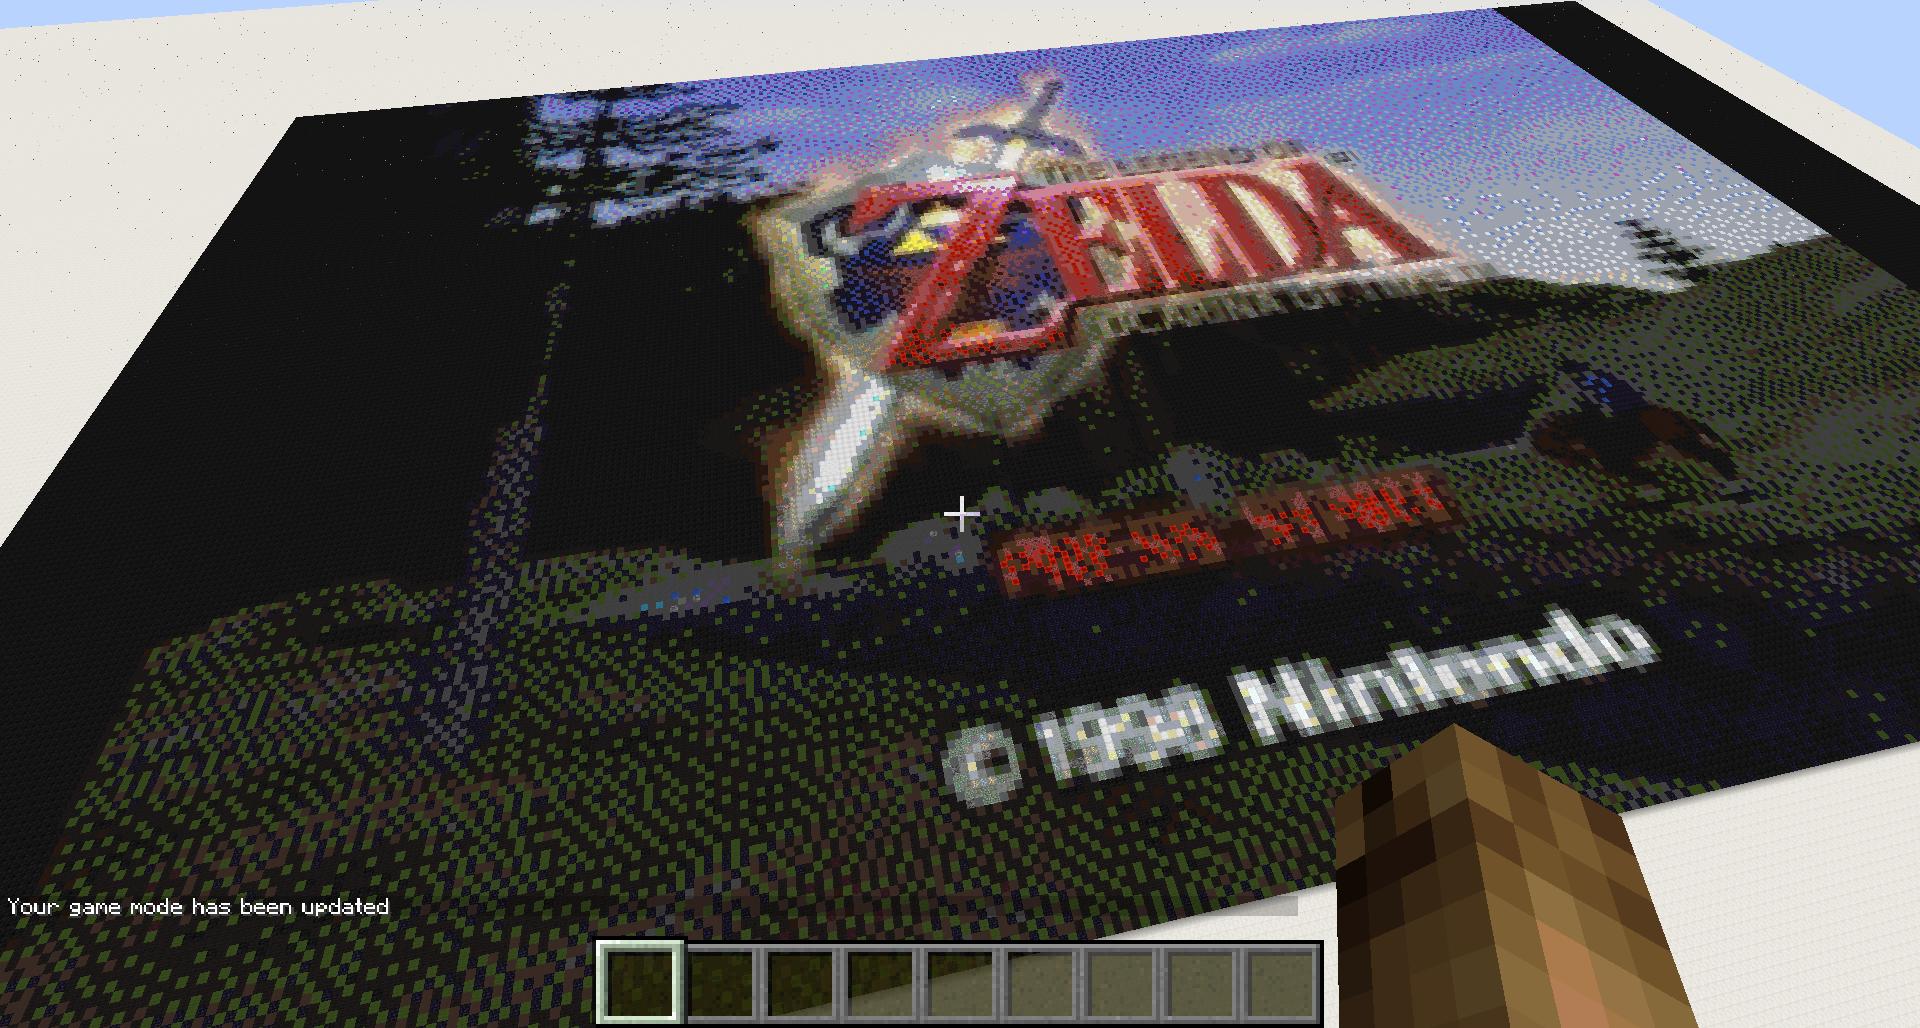 Legend of Zelda: Ocarina of Time Intro in Minecraft